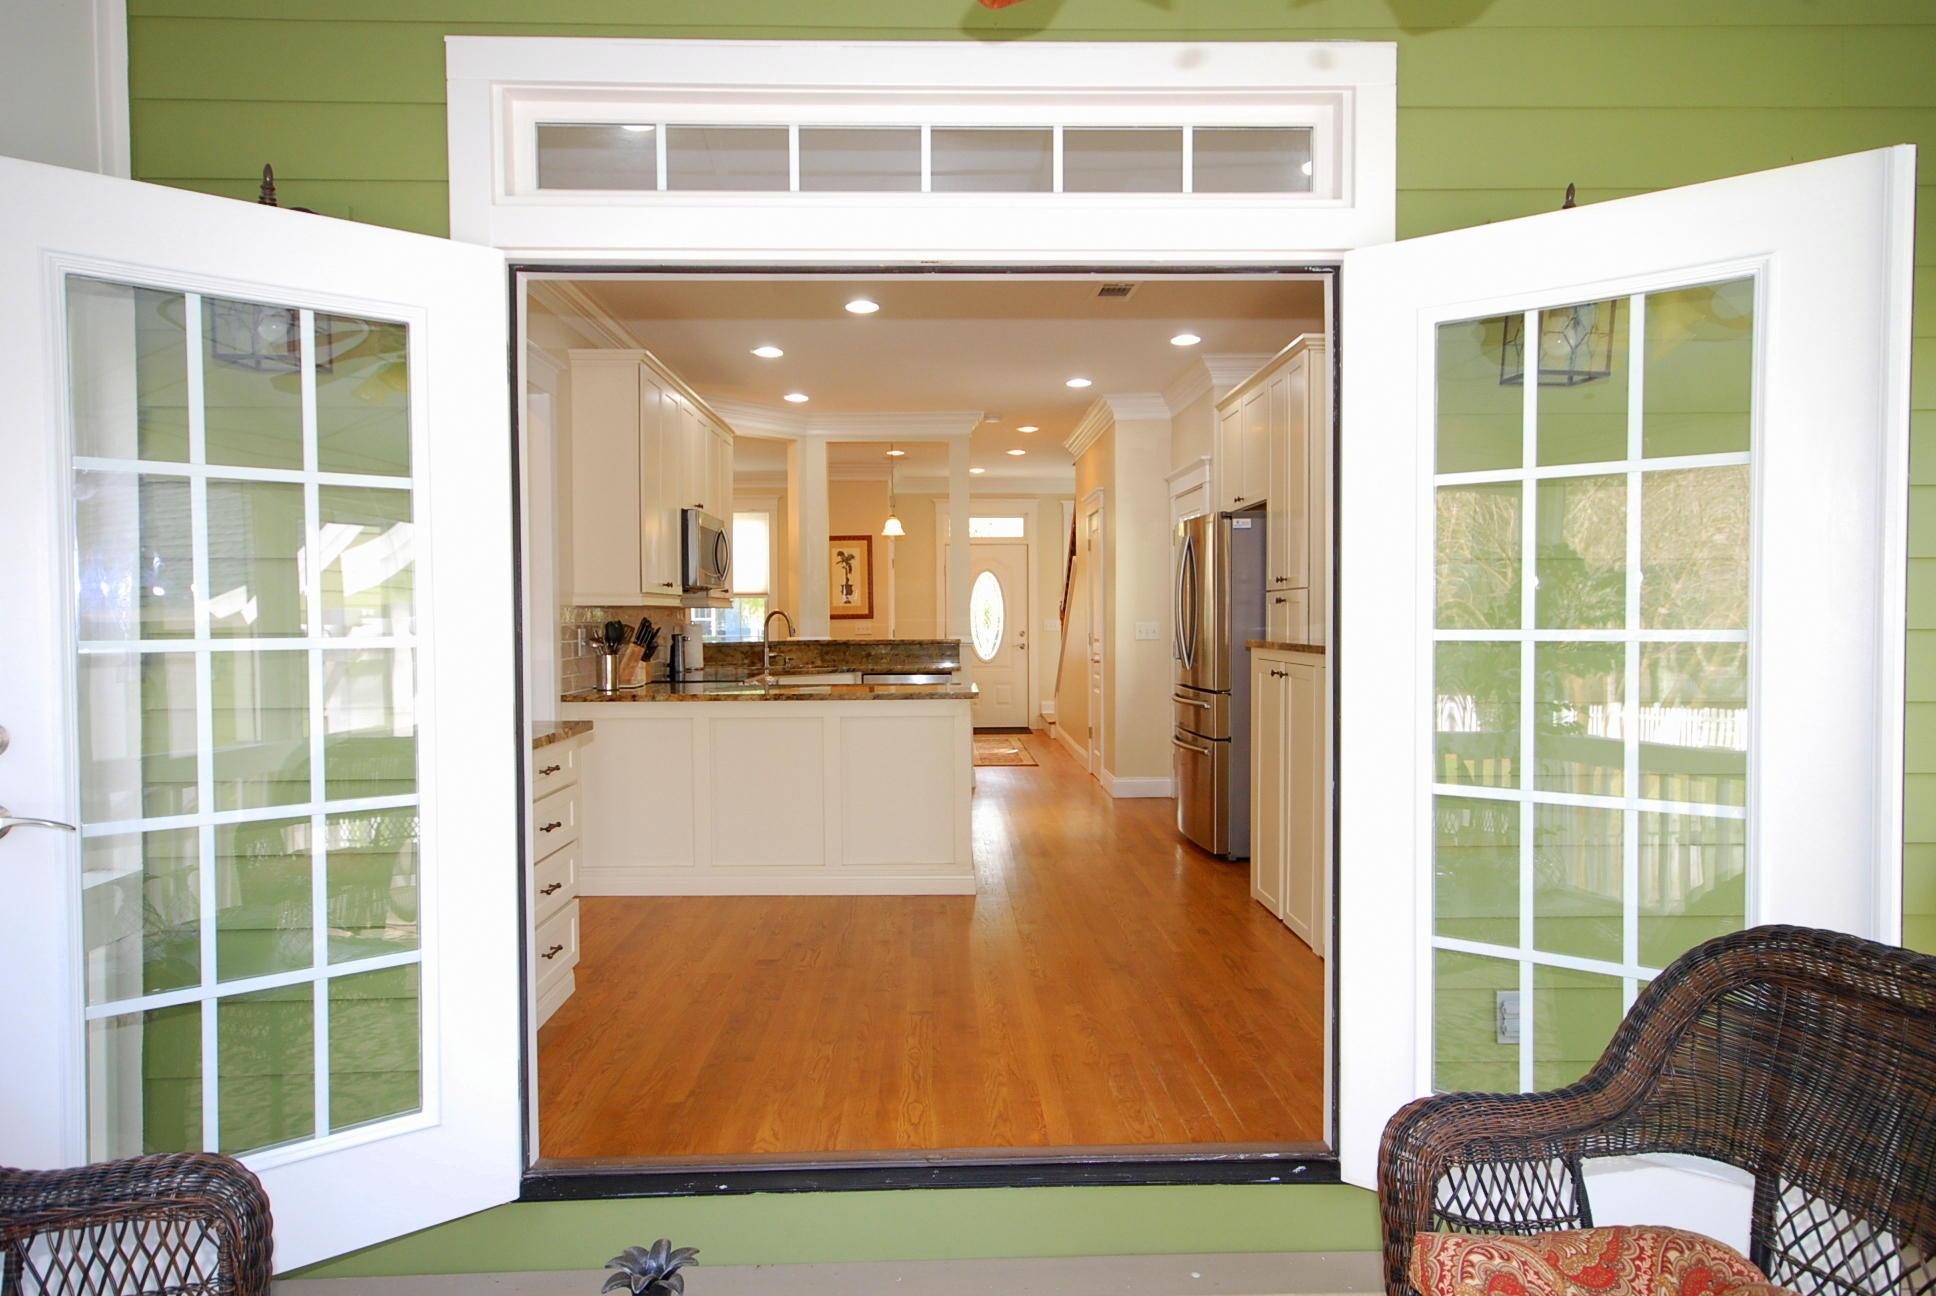 Daniel Island Homes For Sale - 100 Jordan, Daniel Island, SC - 0